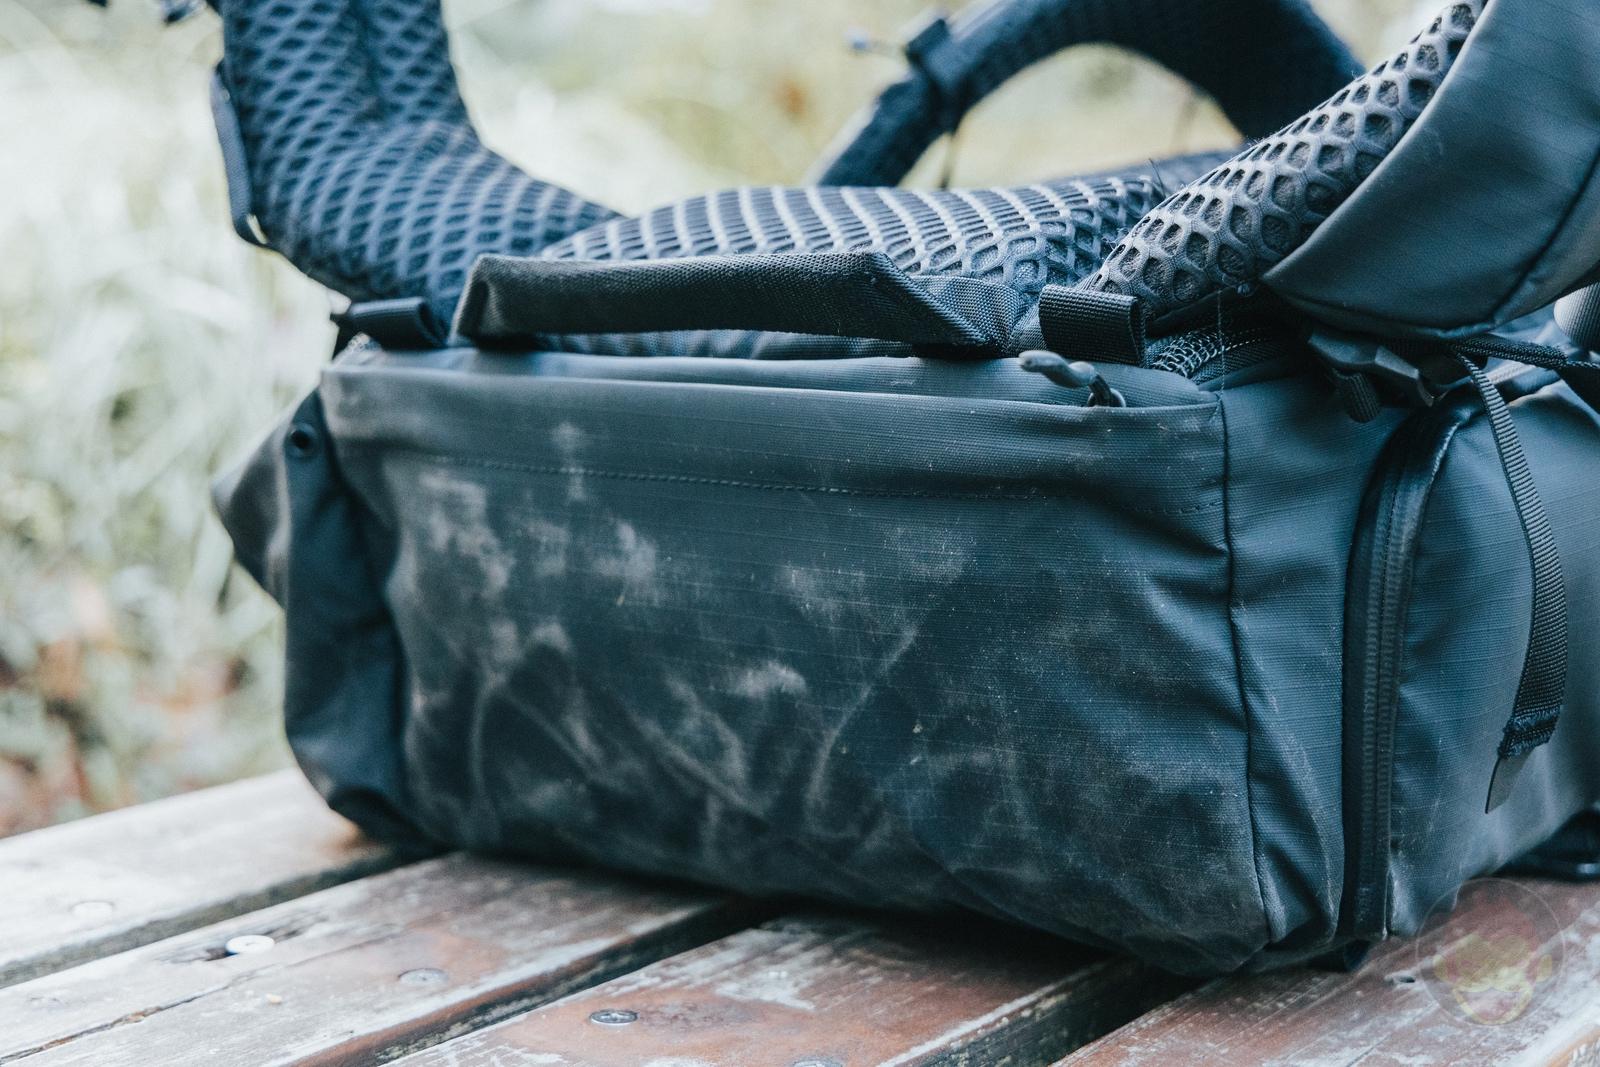 WANDRD FERNWEH Backpack Review 01